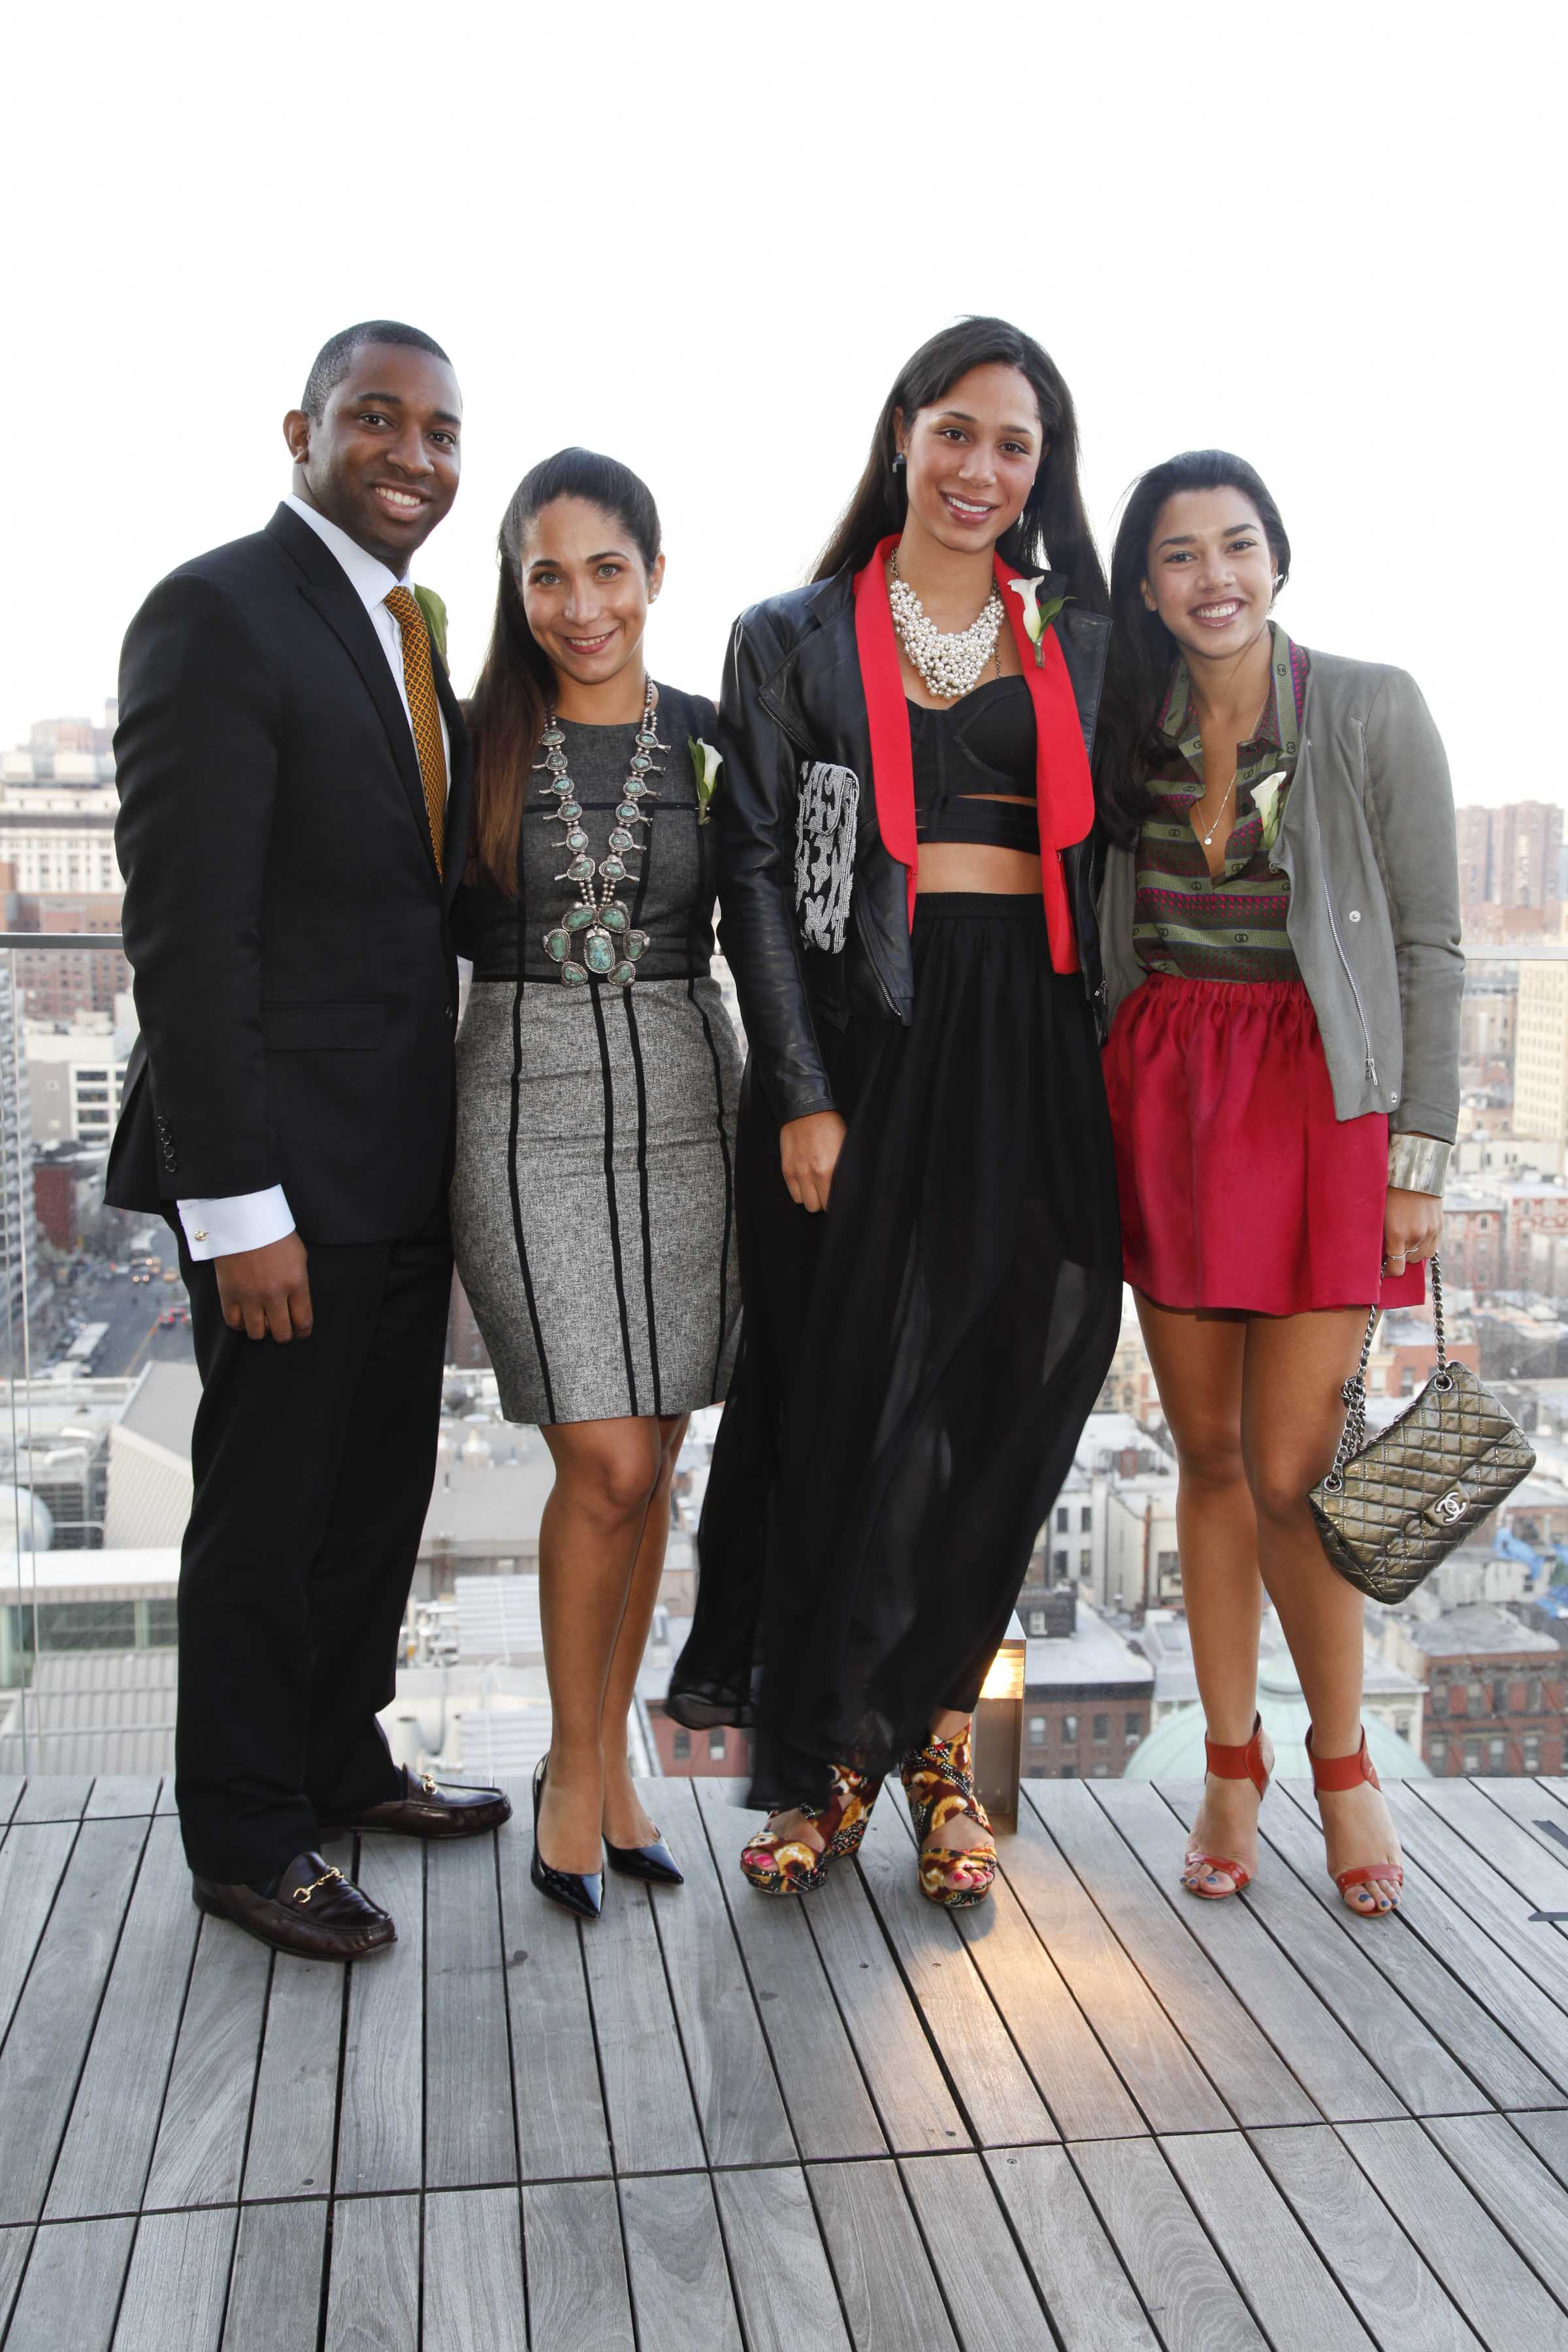 Jay Lundy, Honor McGee, Jenny Obiaya and Hannah Bronfman